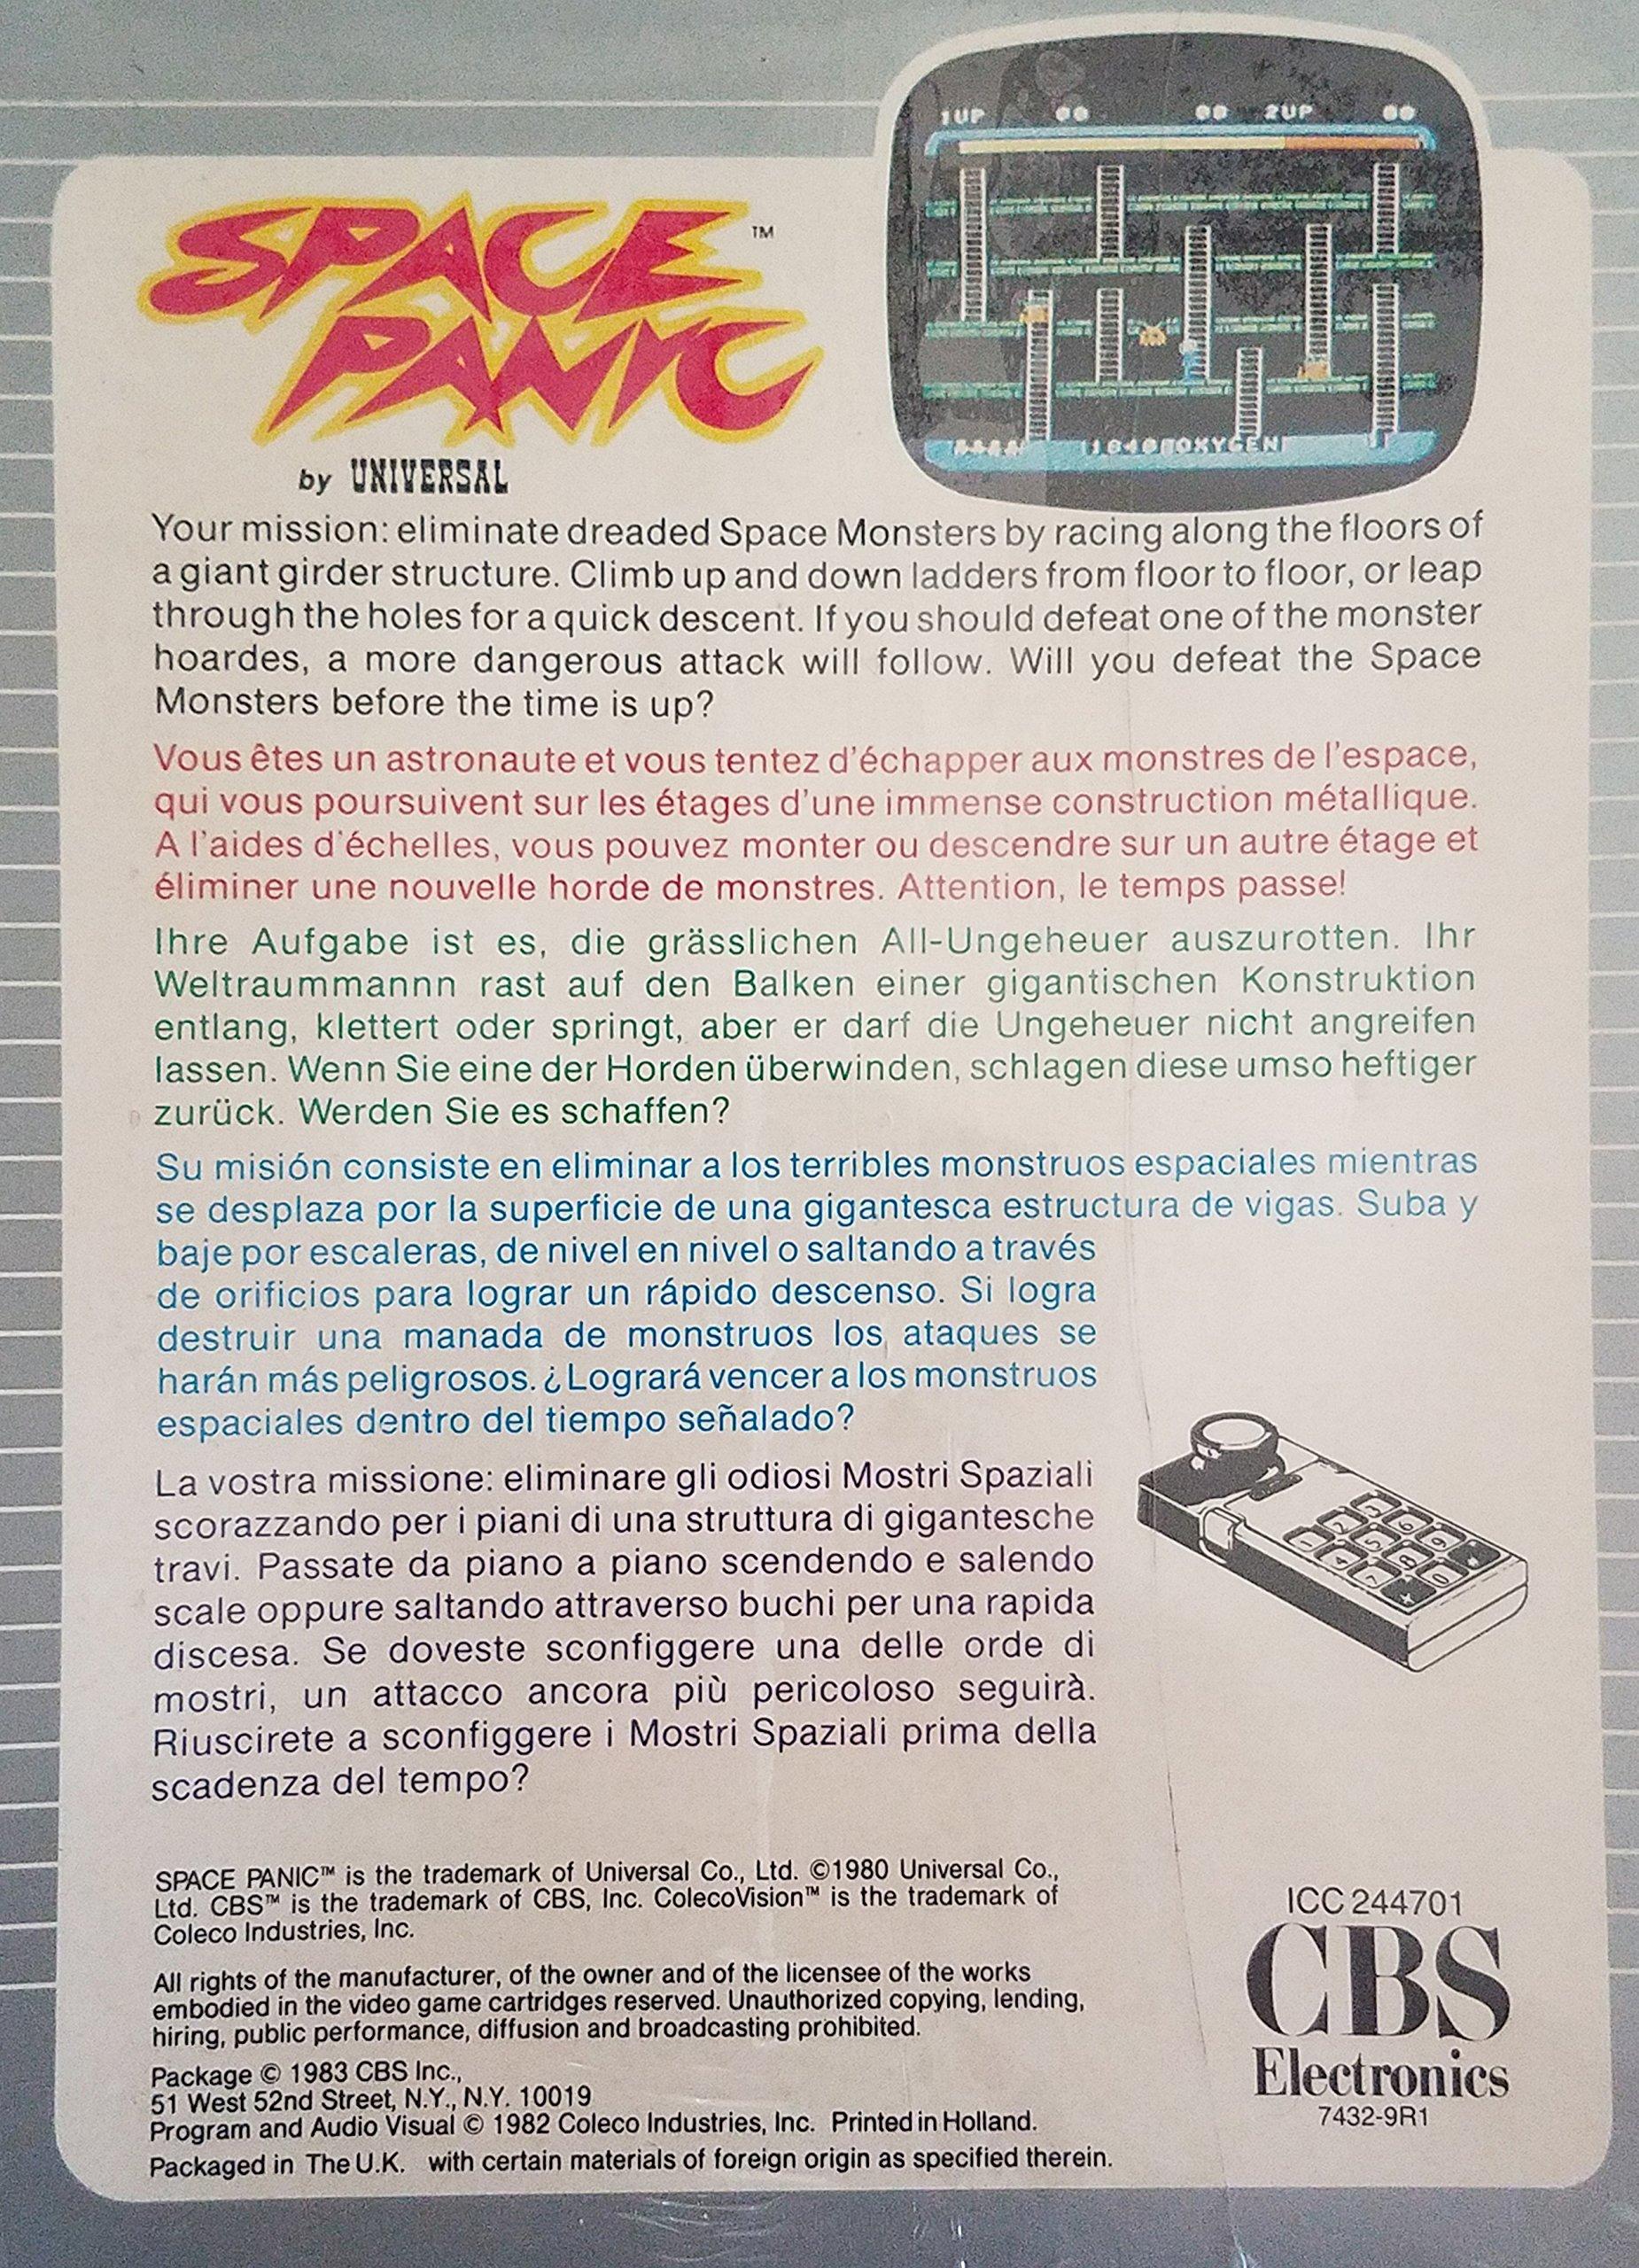 Space Panic - ColecoVision (CBS Electronics International Verison) by CBS Electronics (Image #2)